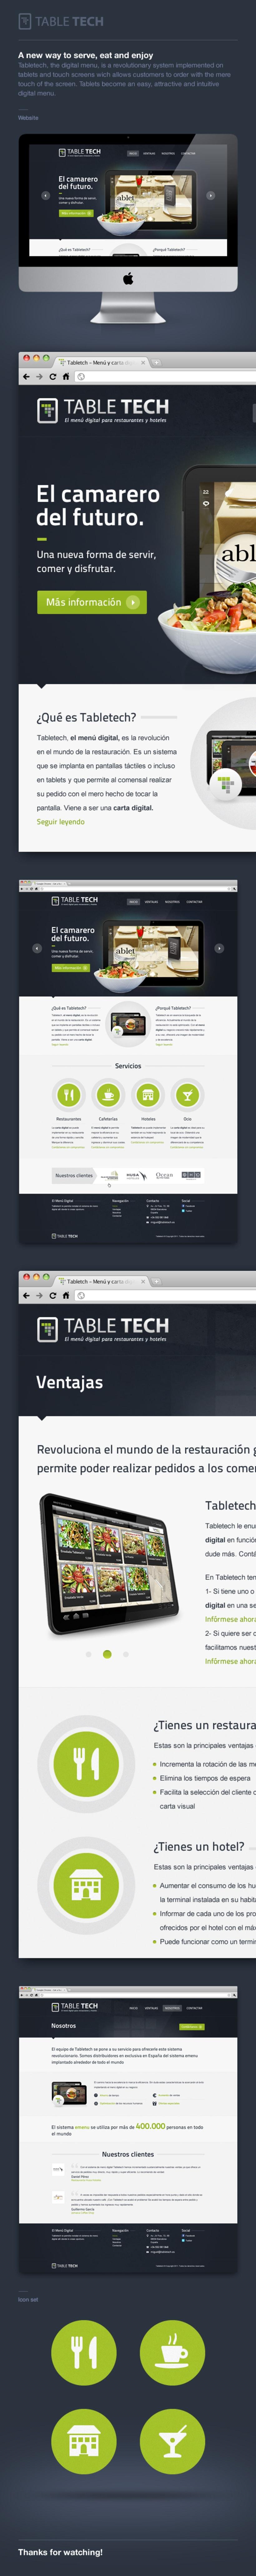 Tabletech 1